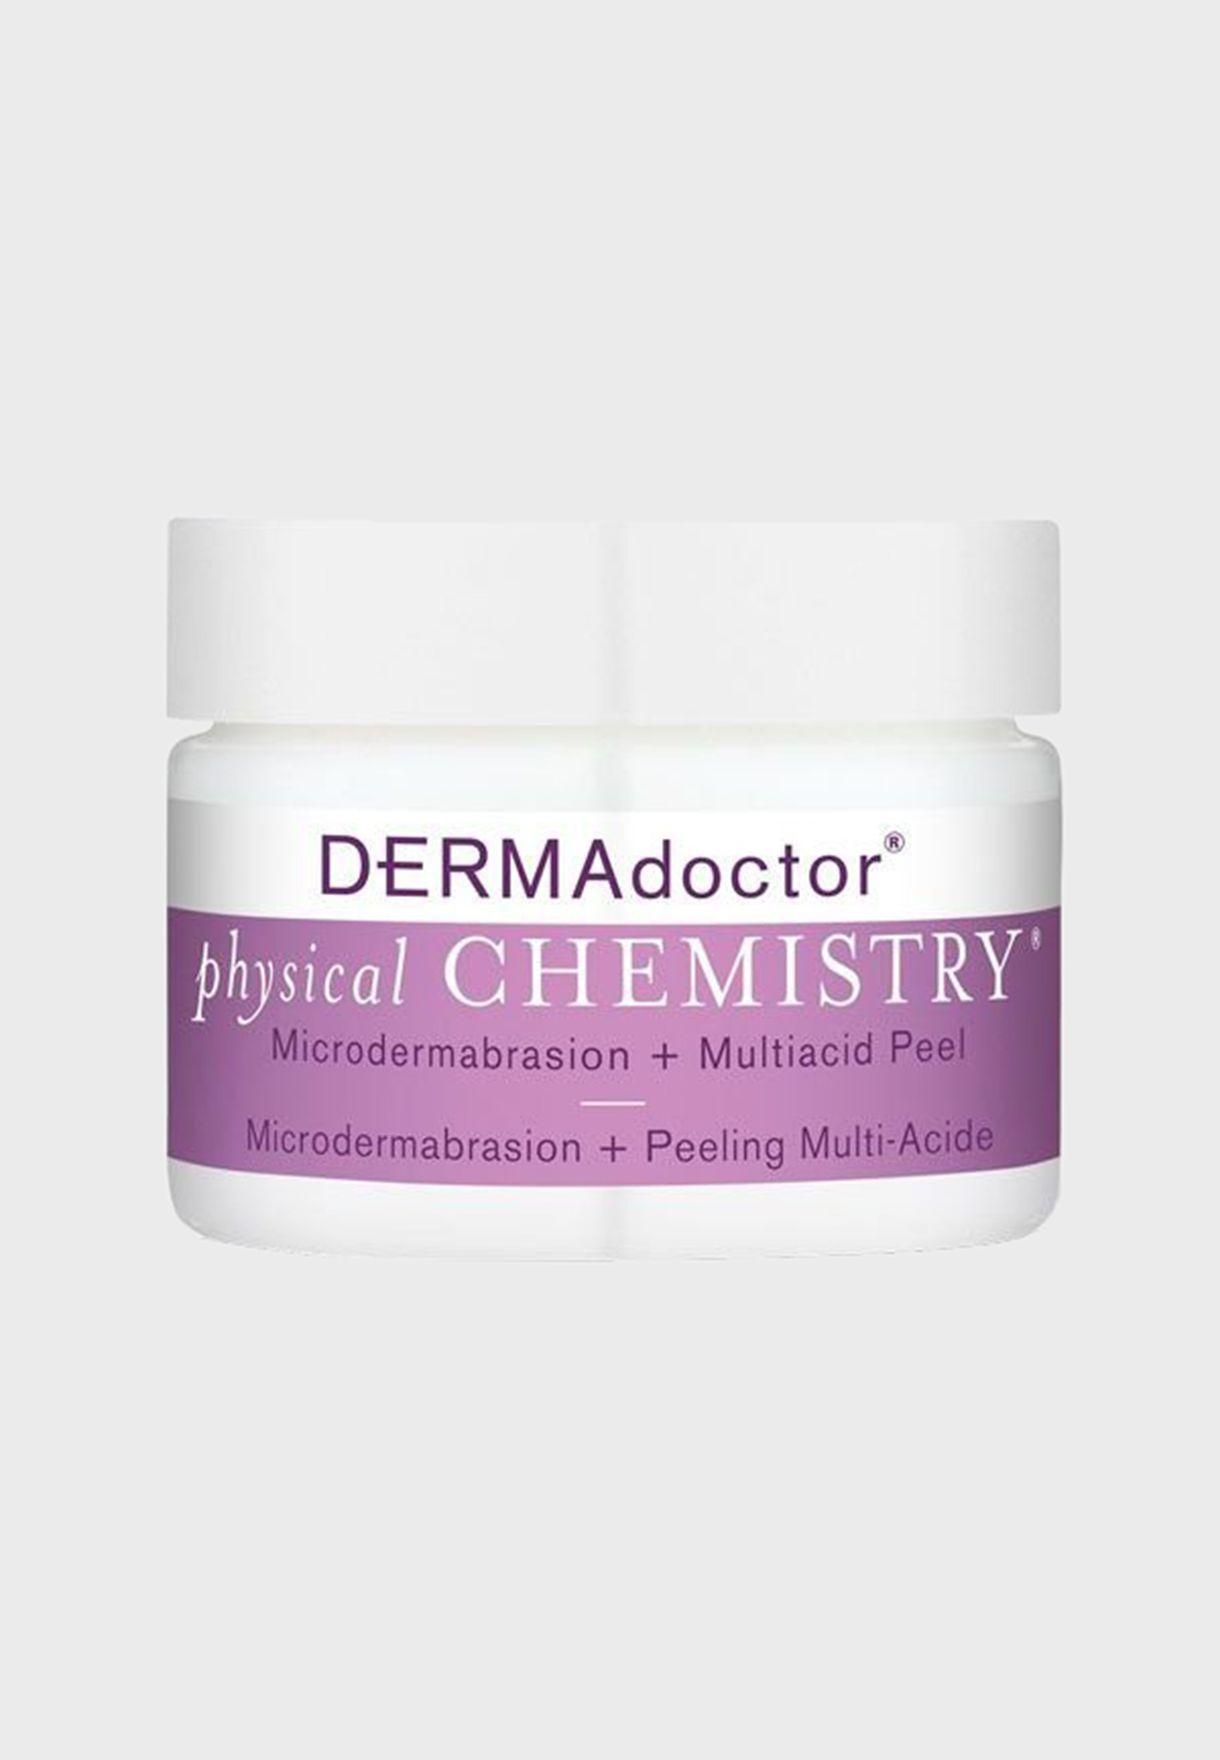 Facial Microdermabrasion + Multiacid Chemical Peel